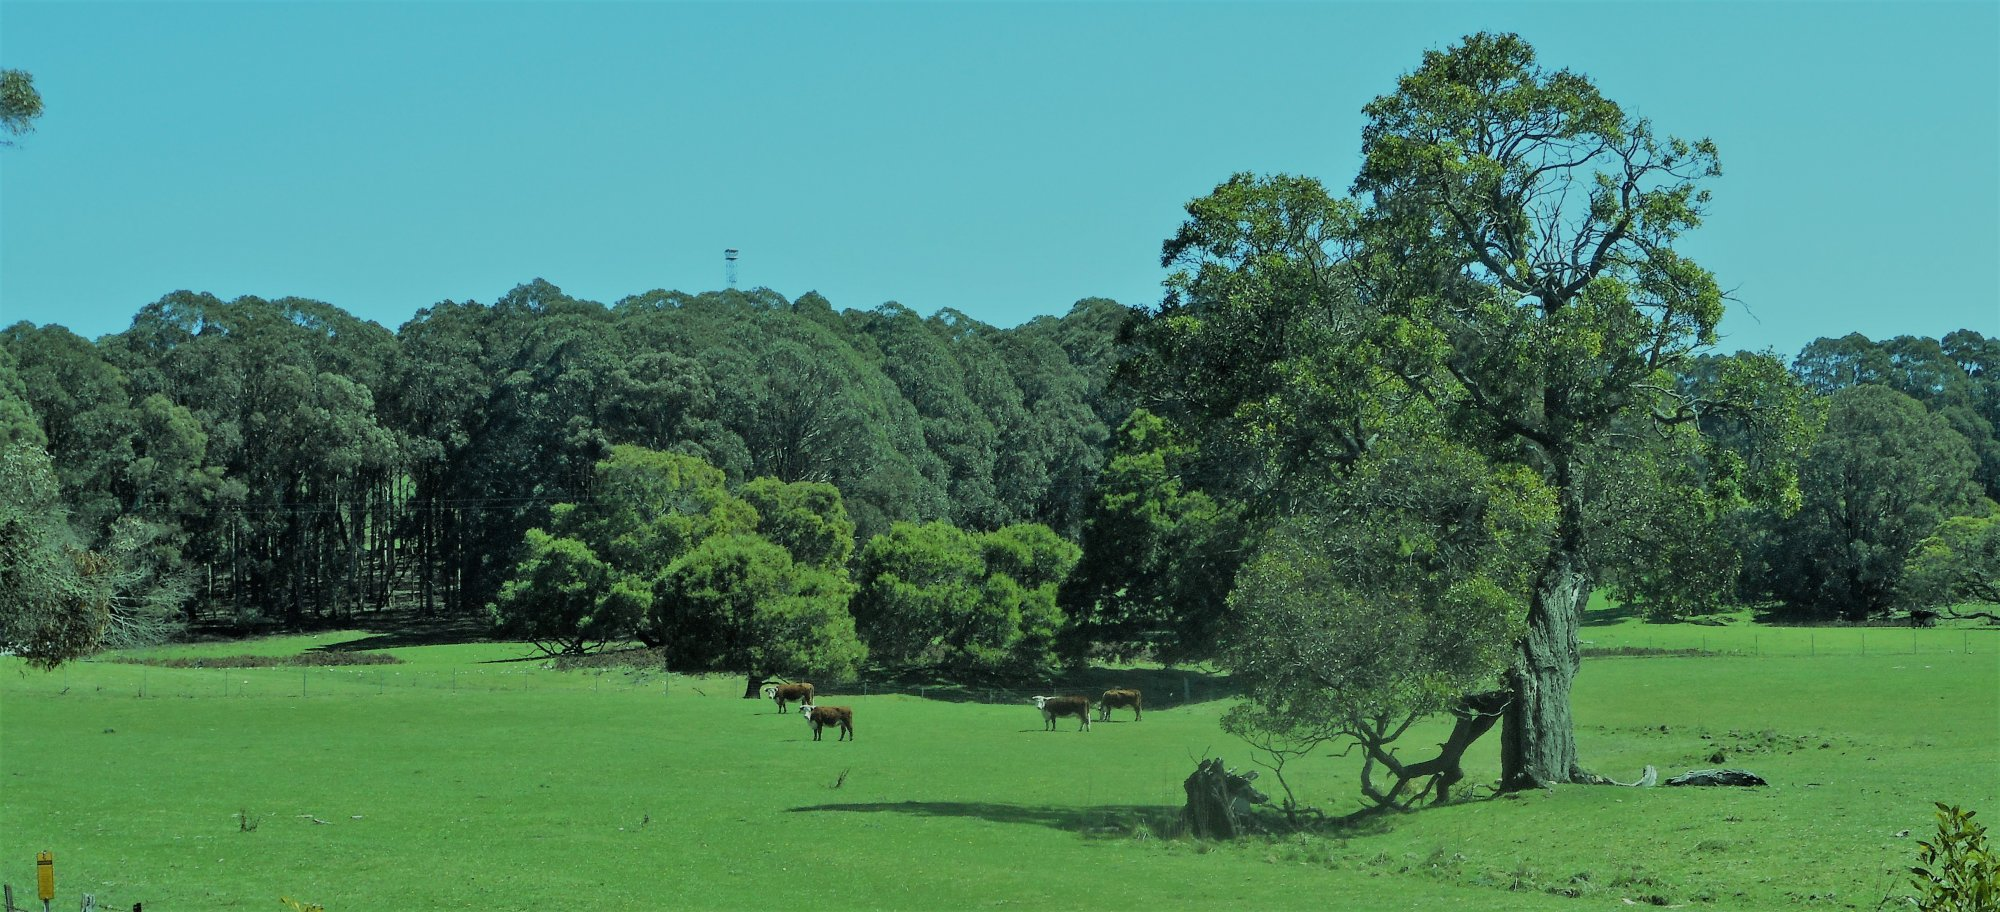 shooters cattle.JPG